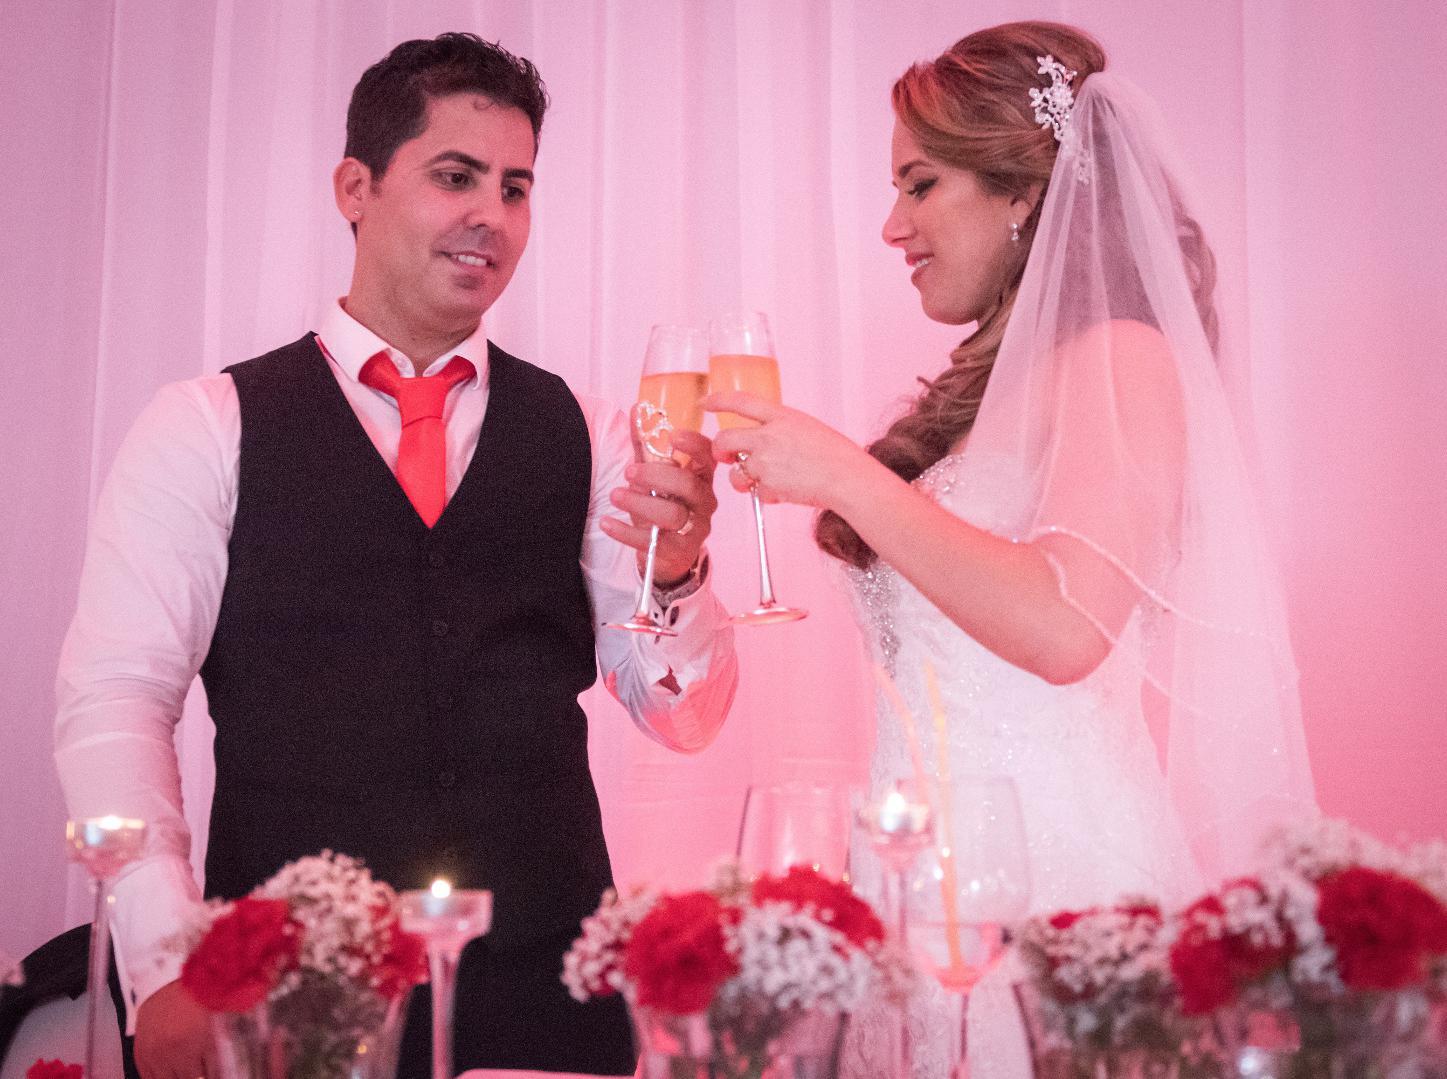 bodas-sin-clasificar-sin-tema-cuba-28322.jpg